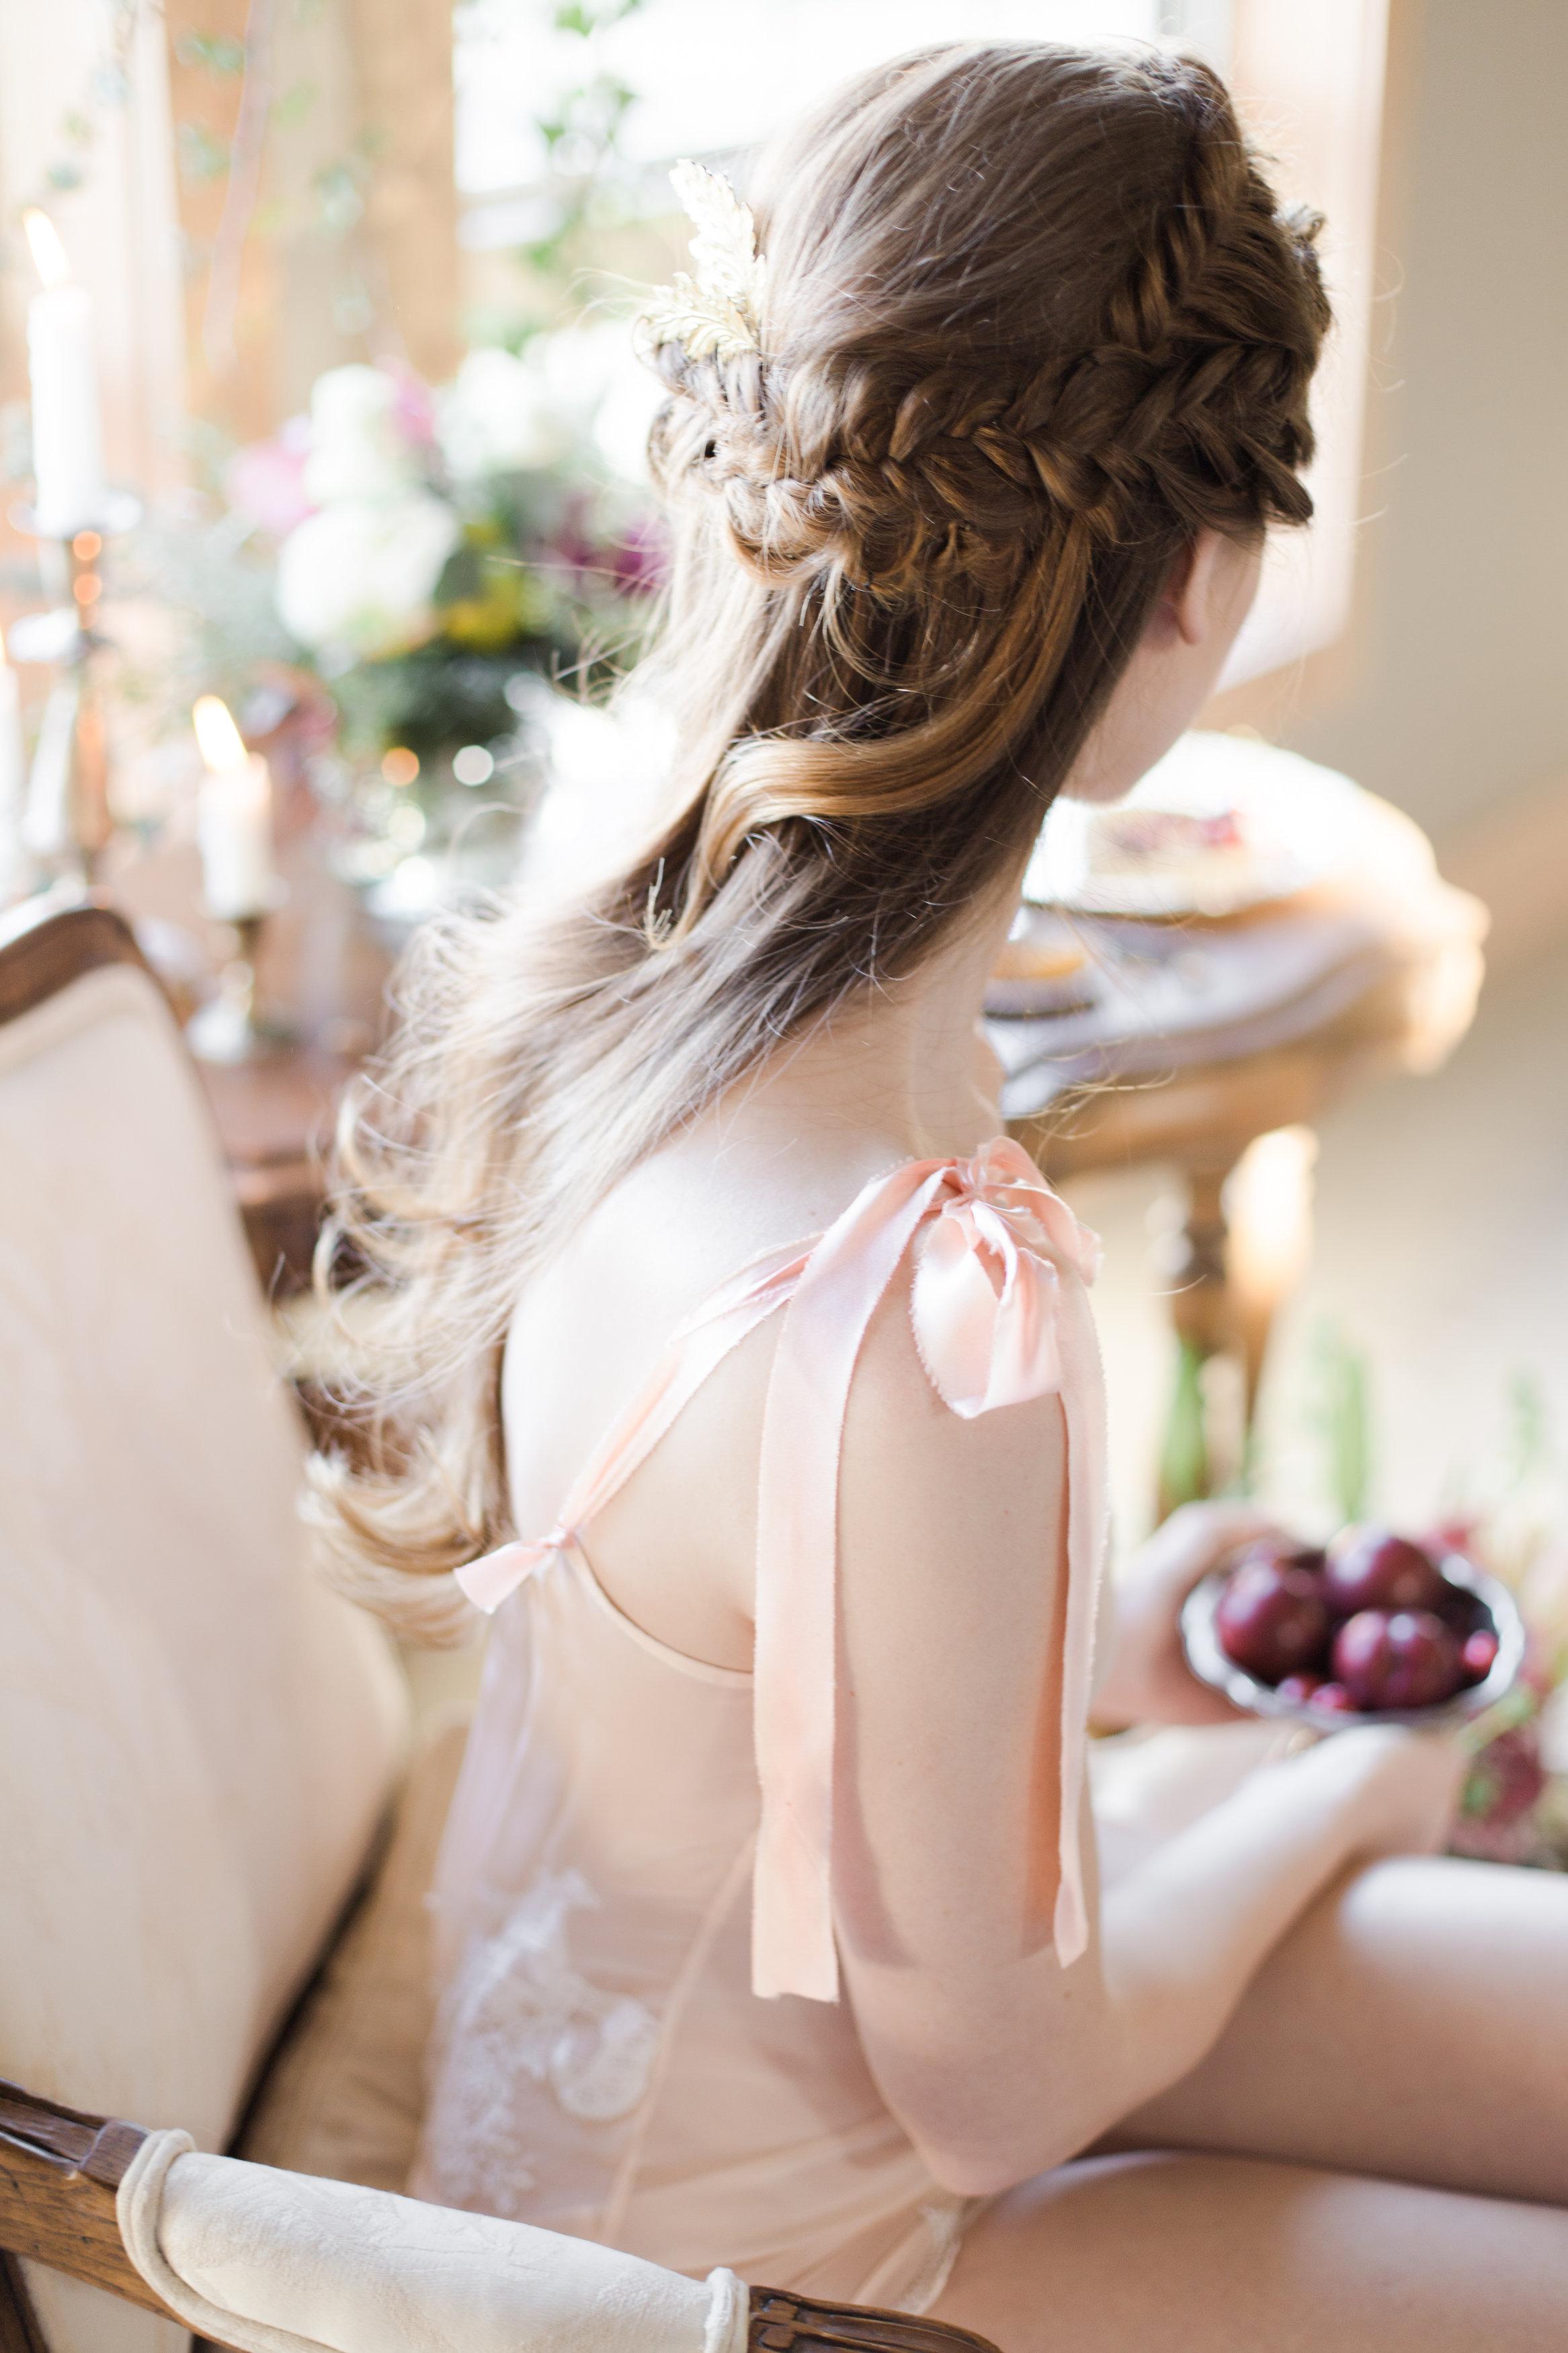 jennifer-munoz,boise-wedding-photographer,boise-boudoir-photographer,still-water-hollow-270.jpg